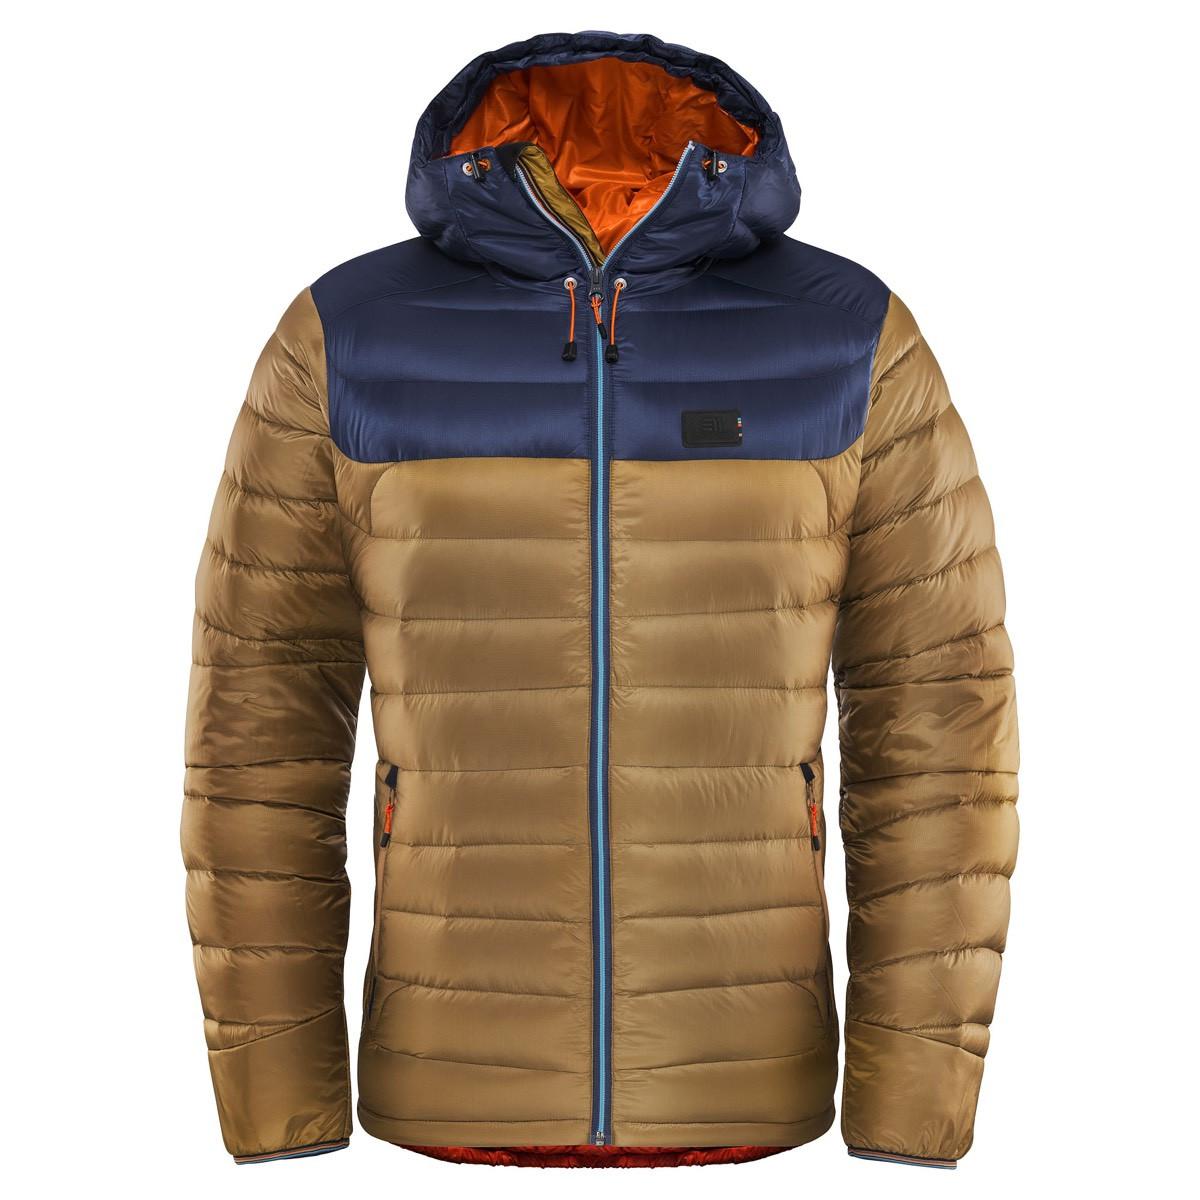 4d4ddbedd33 E11 Men's Agile Jacket Pecan Brown E11 Men's Agile Jacket Pecan Brown ...